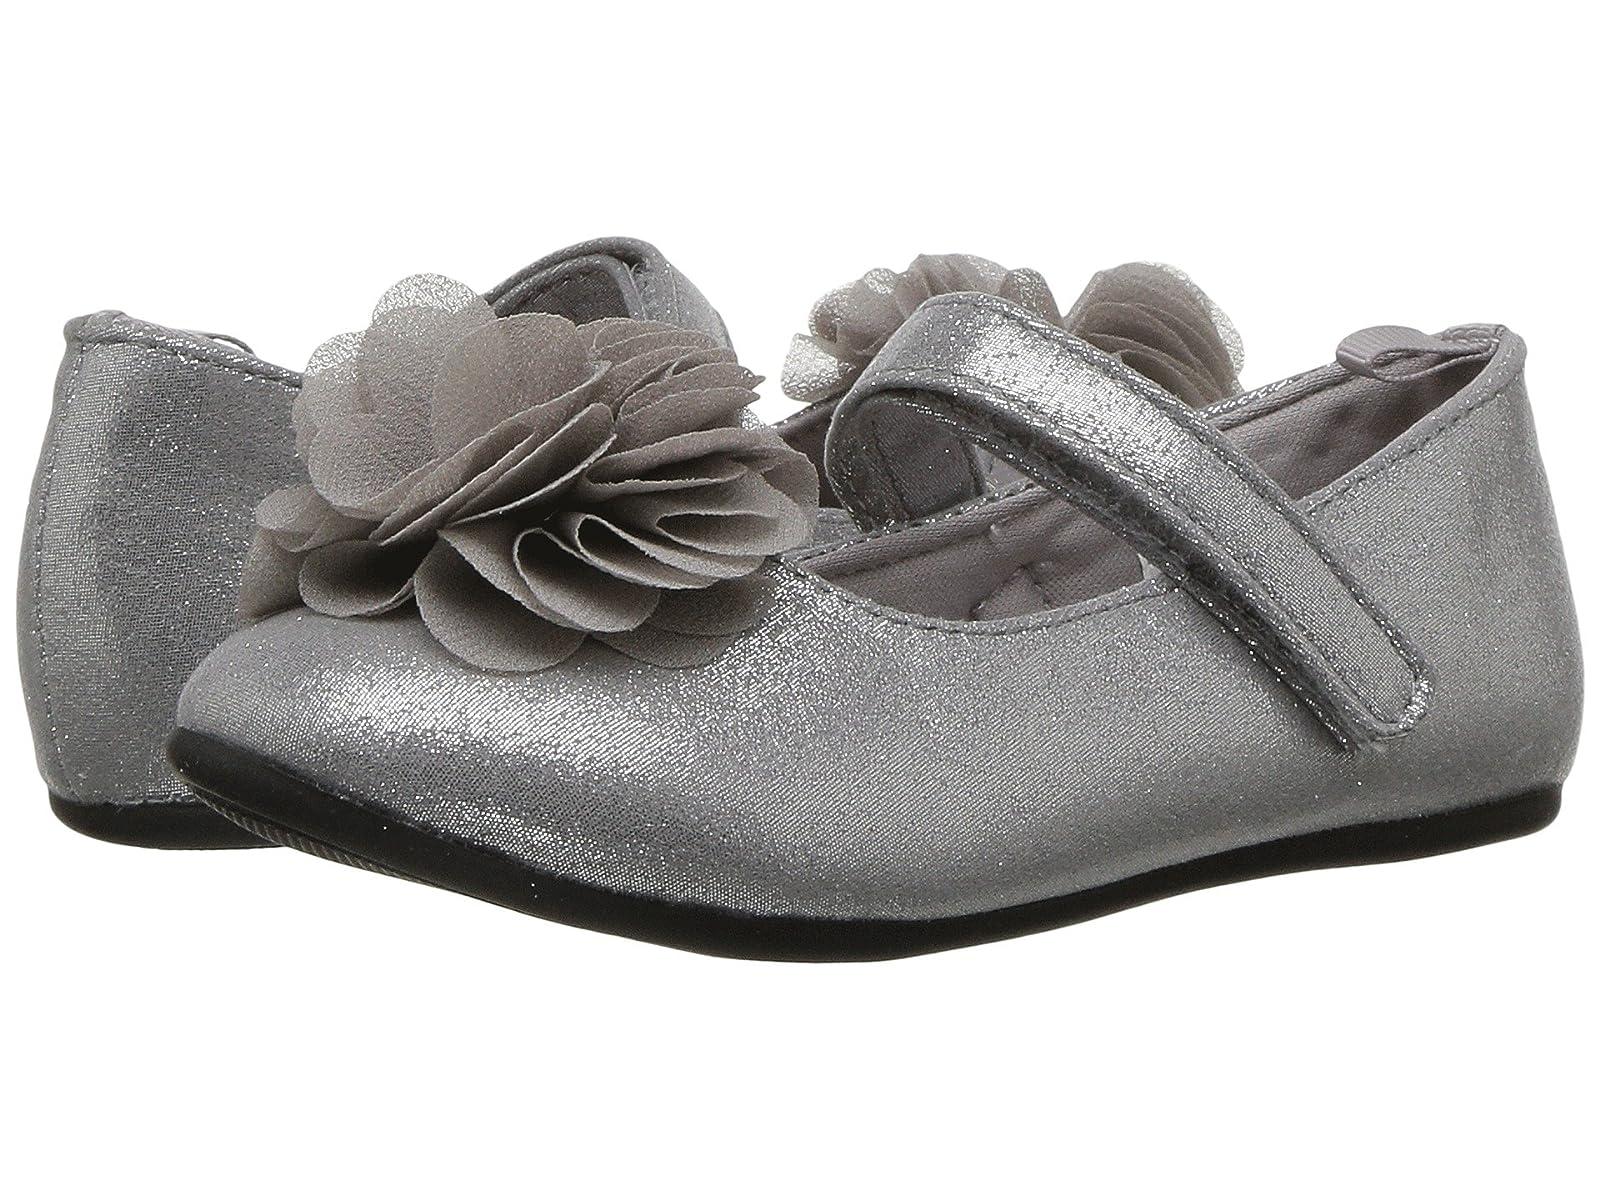 Baby Deer First Steps Dress Flat with Flower (Infant/Toddler)Atmospheric grades have affordable shoes